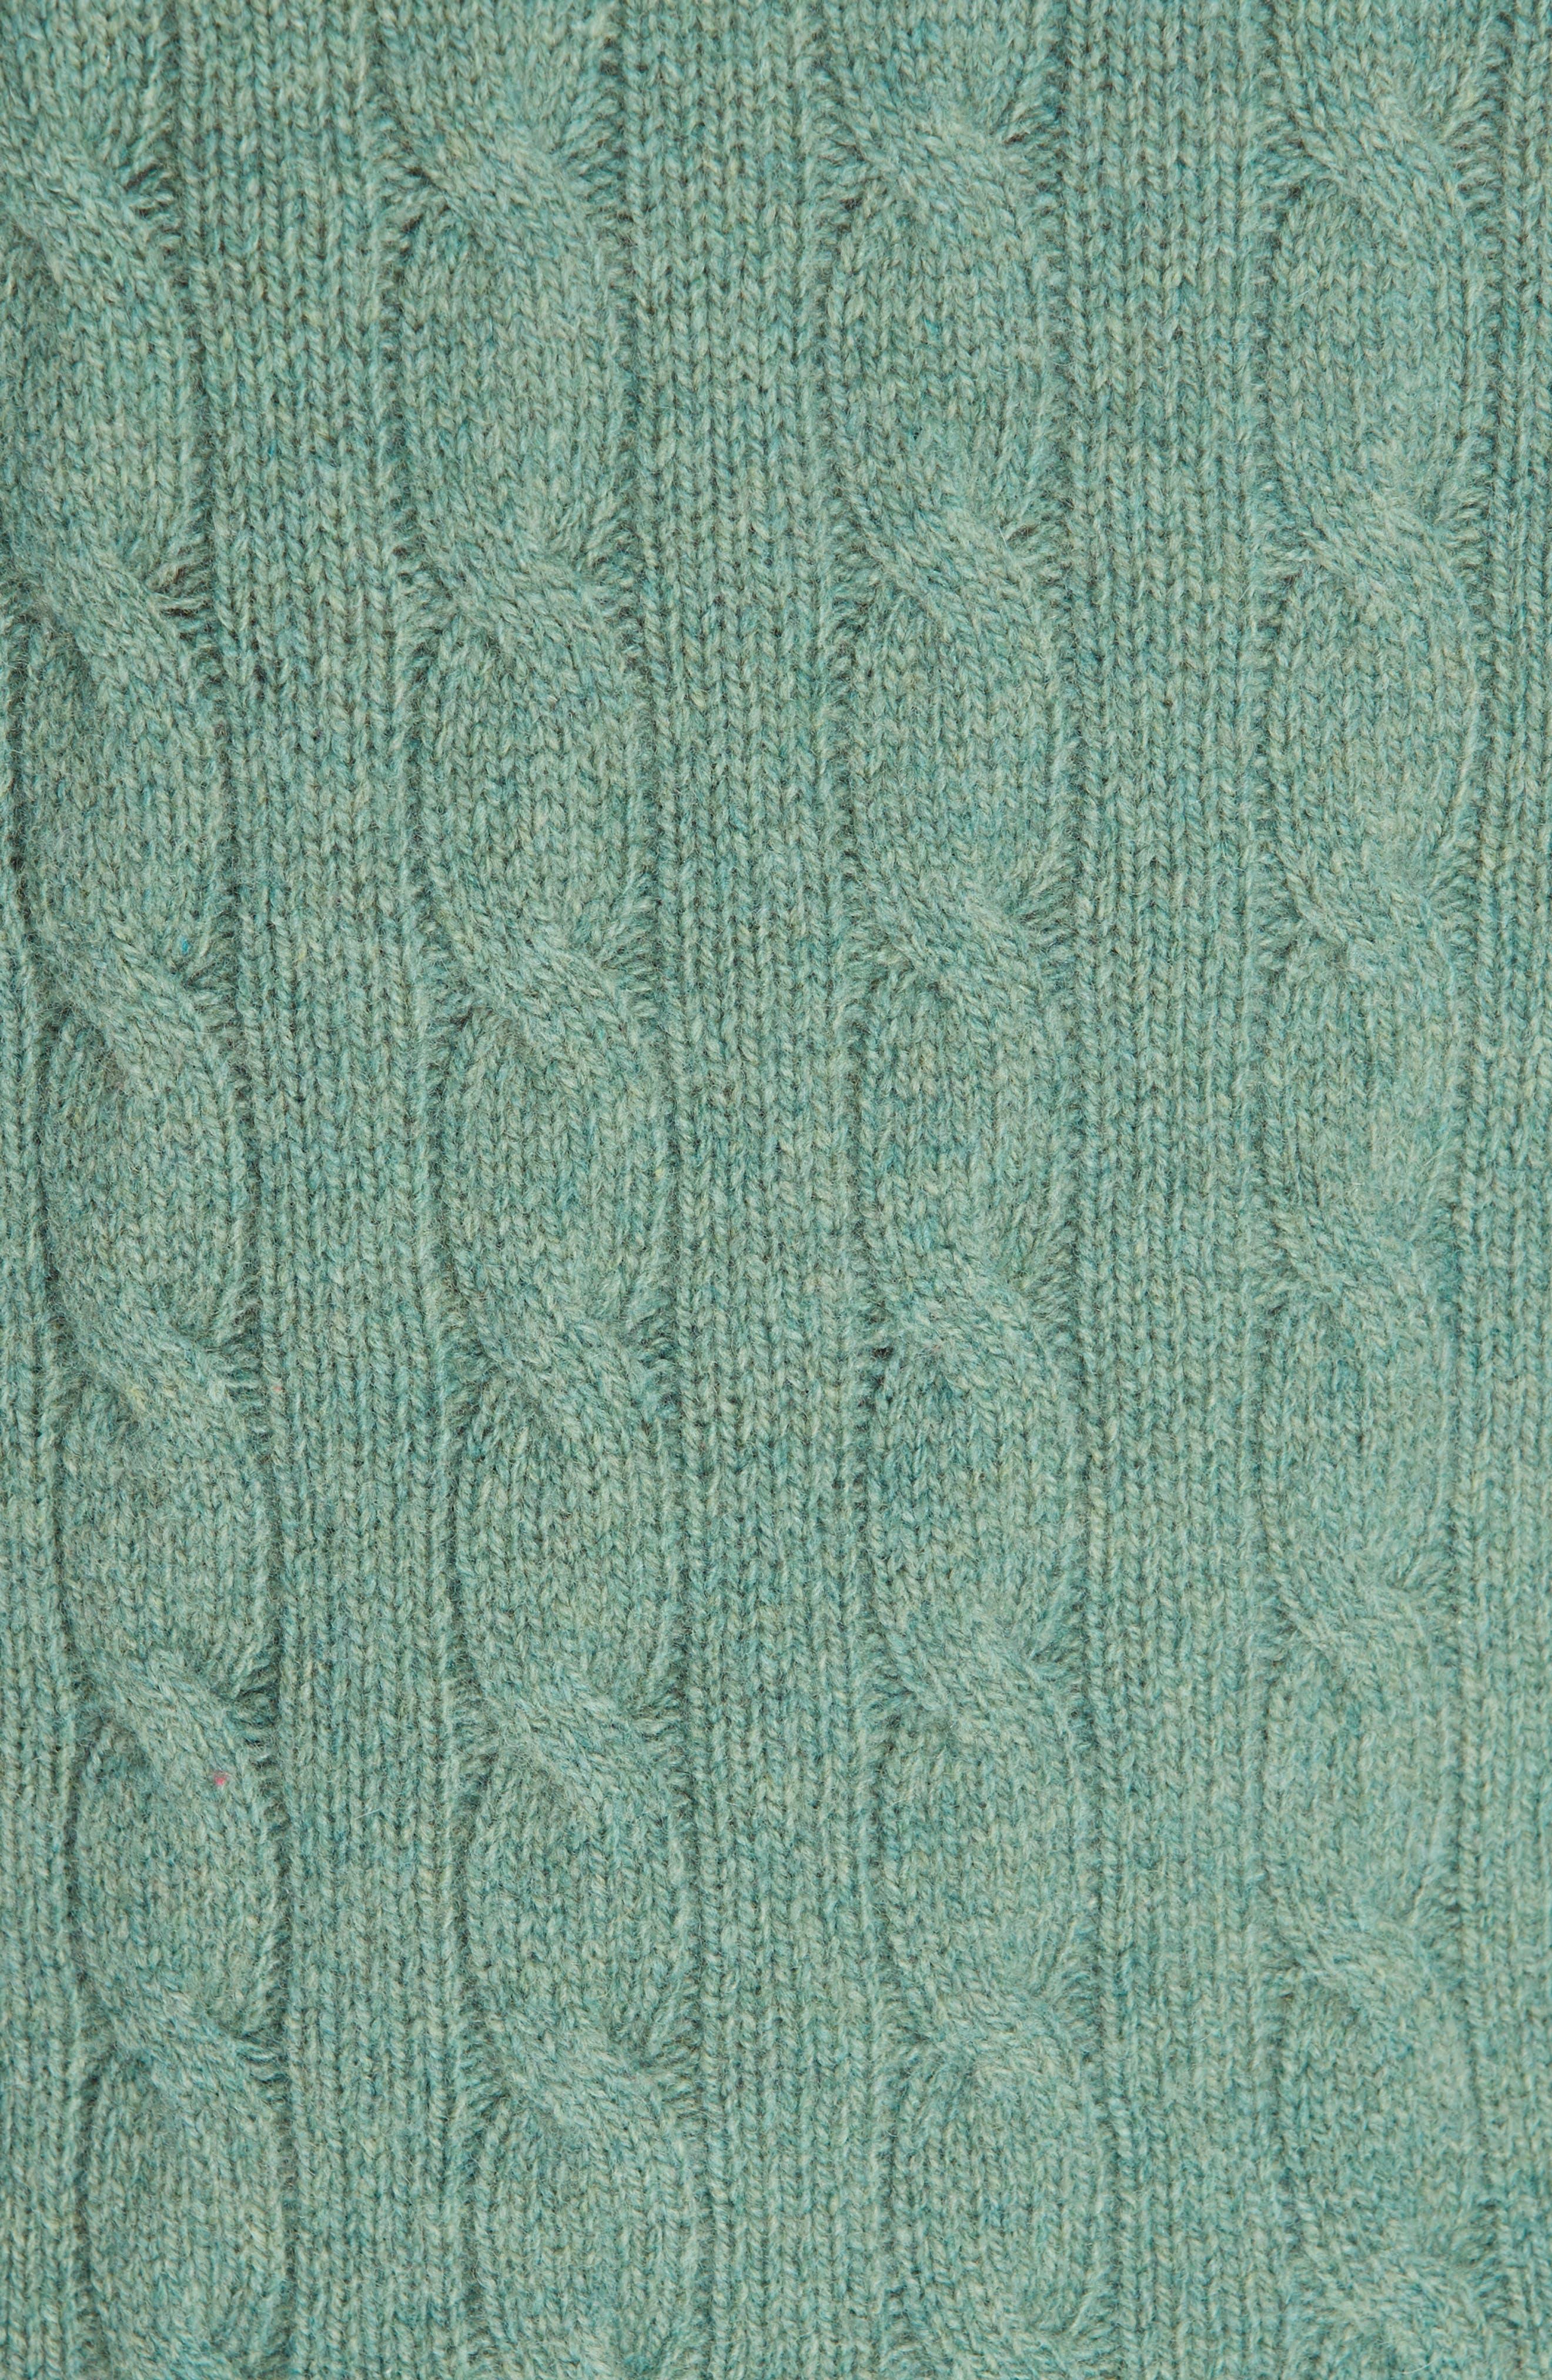 POLO RALPH LAUREN, Cable Knit Cotton Sweater, Alternate thumbnail 5, color, 300